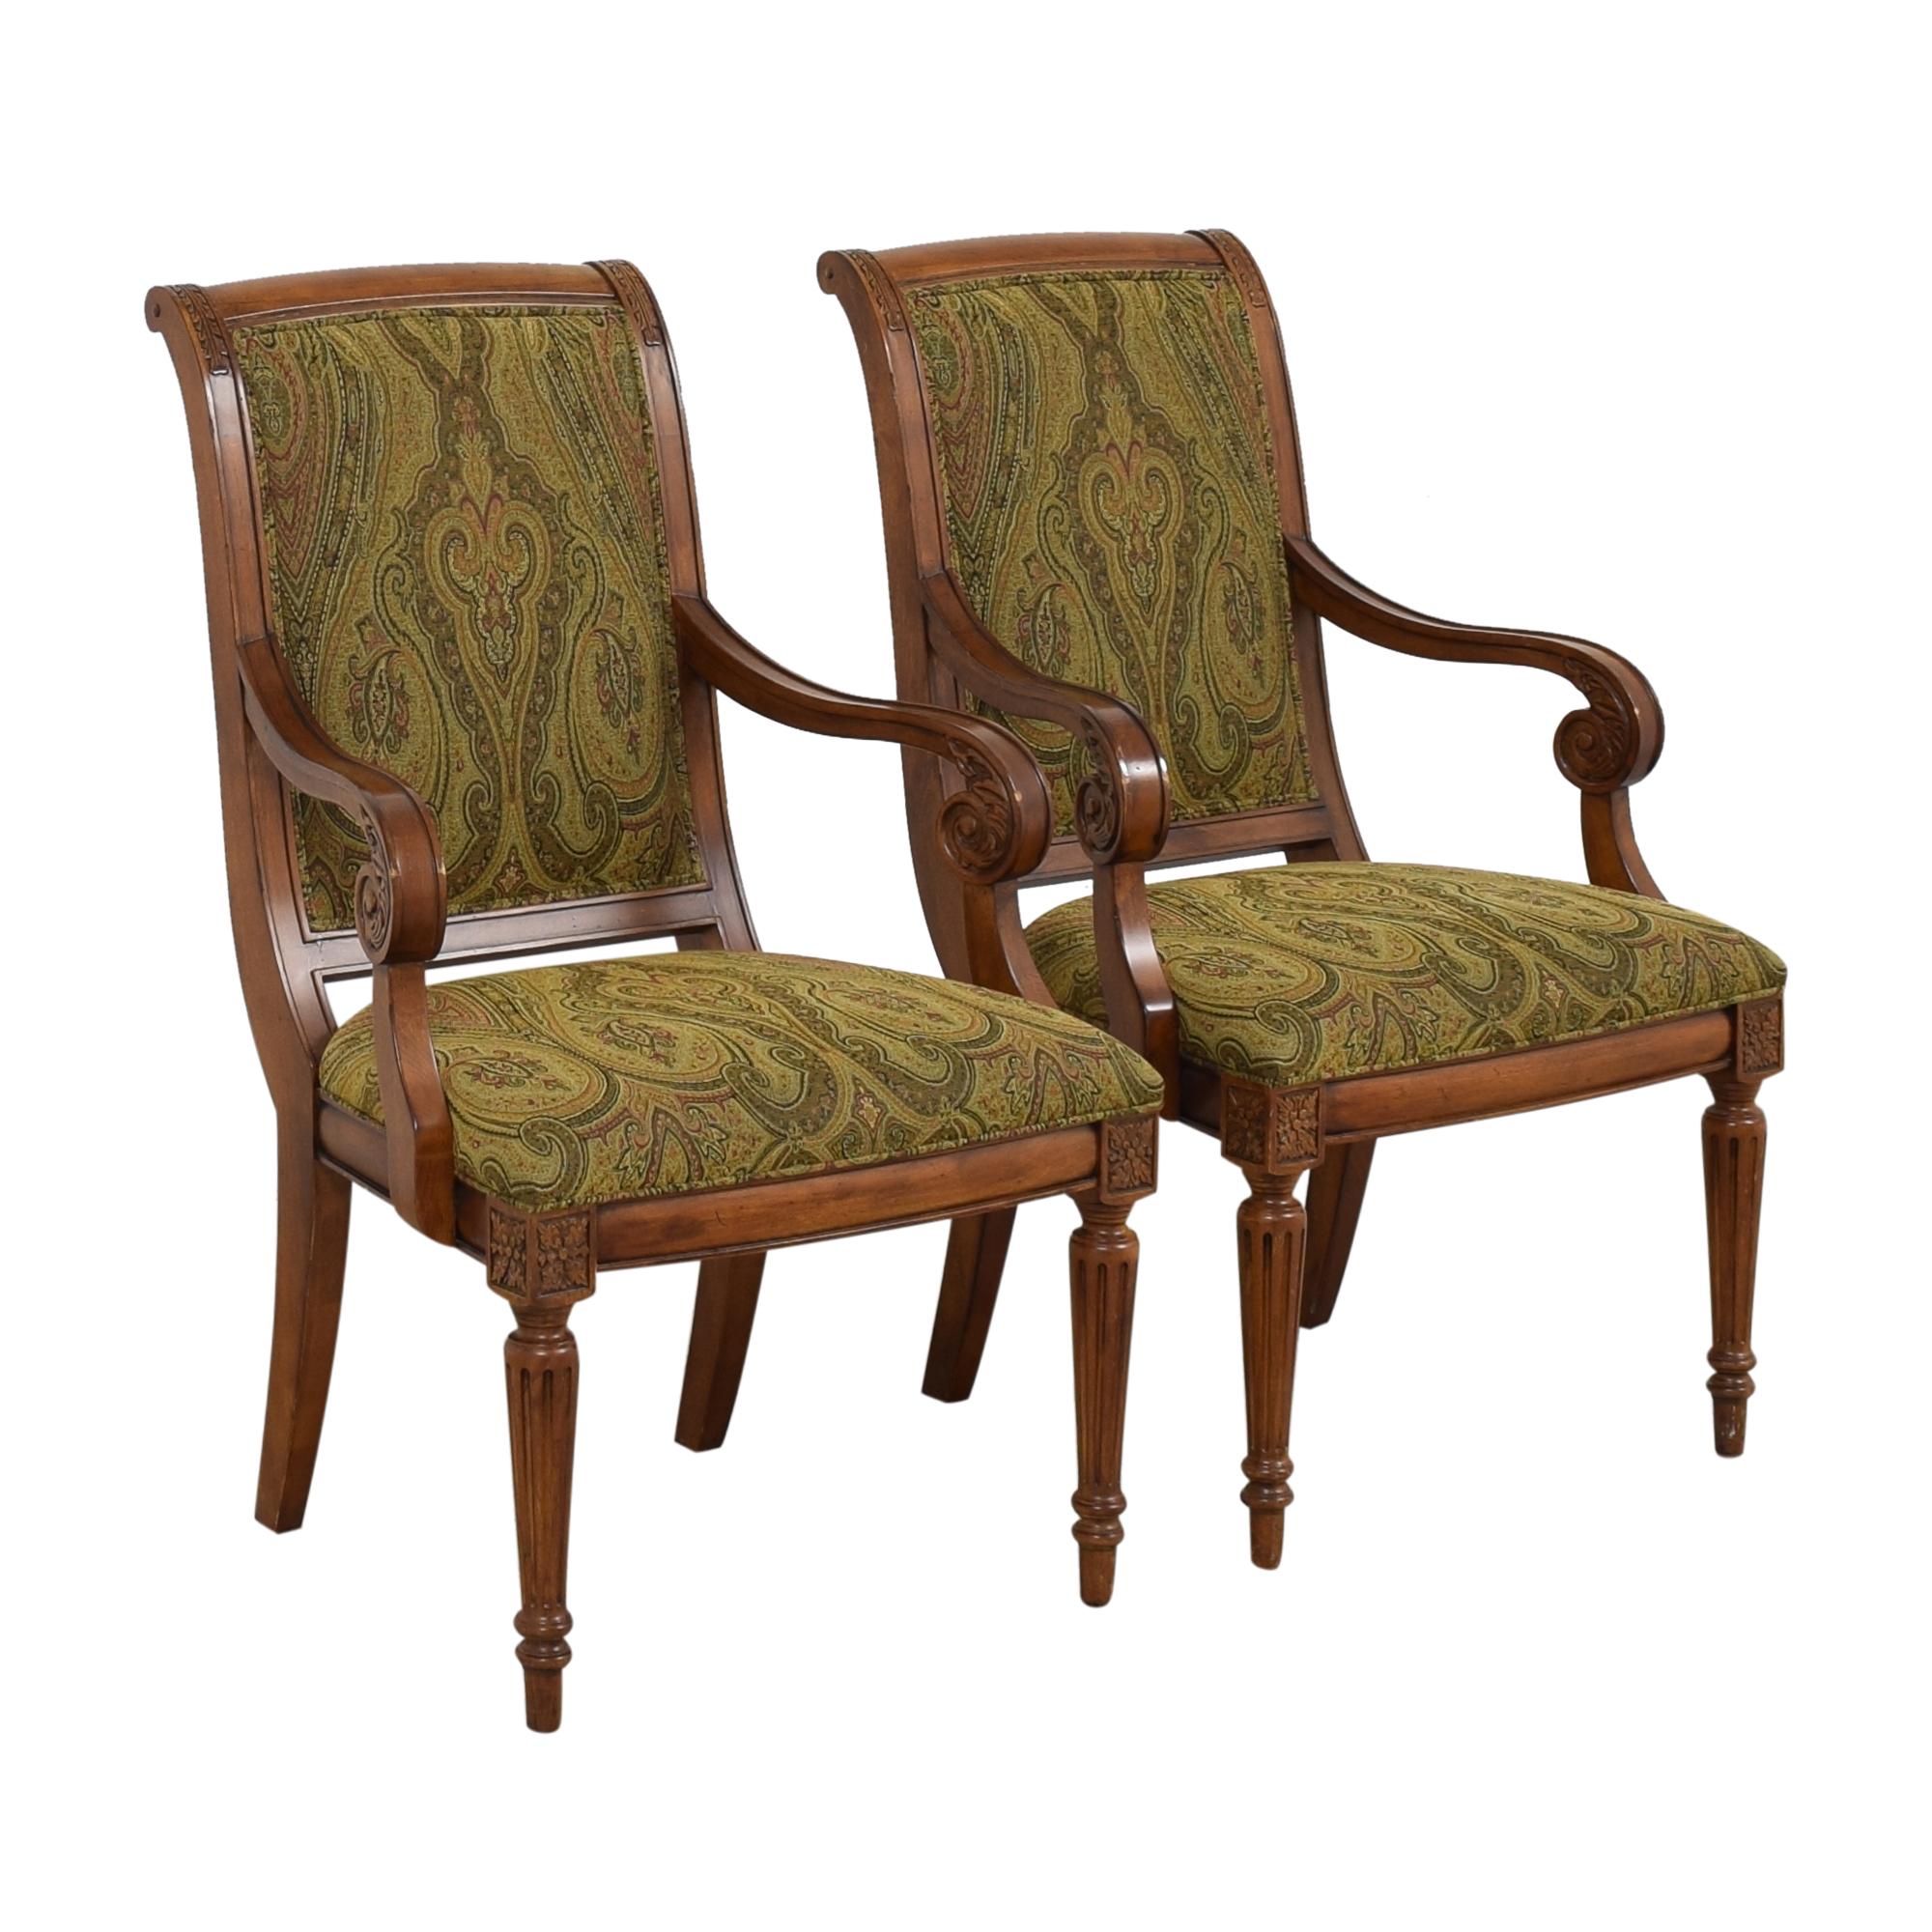 Ethan Allen Ethan Allen Adison Dining Arm Chairs discount